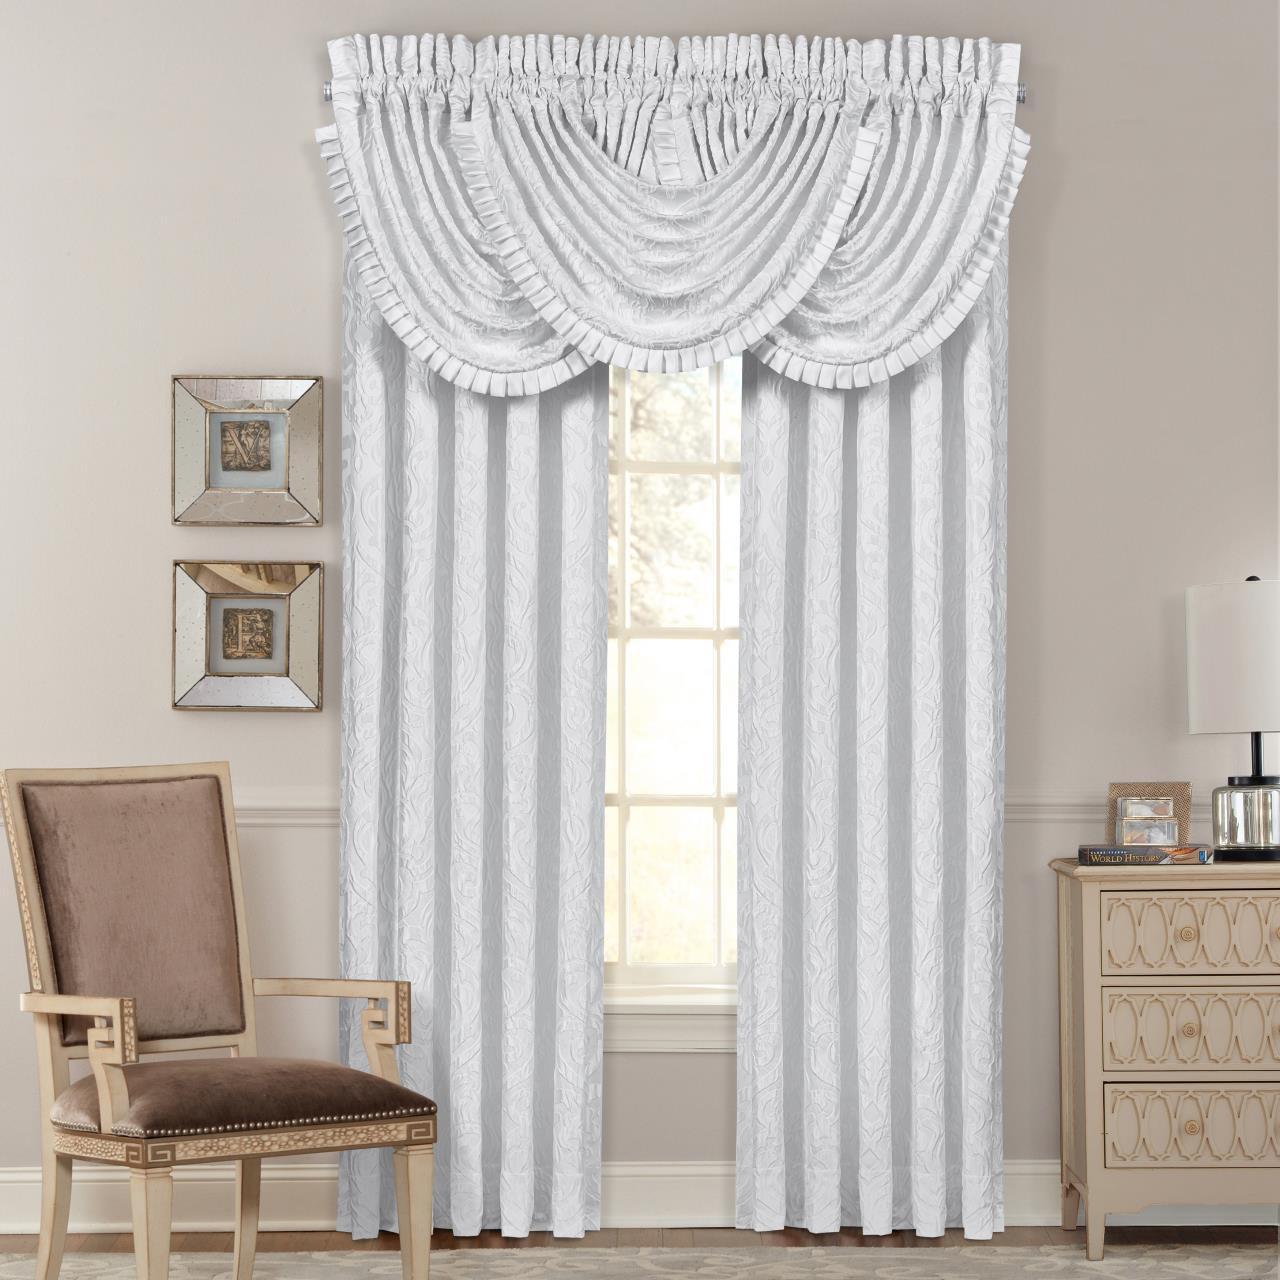 Astoria White Curtains - 846339080395